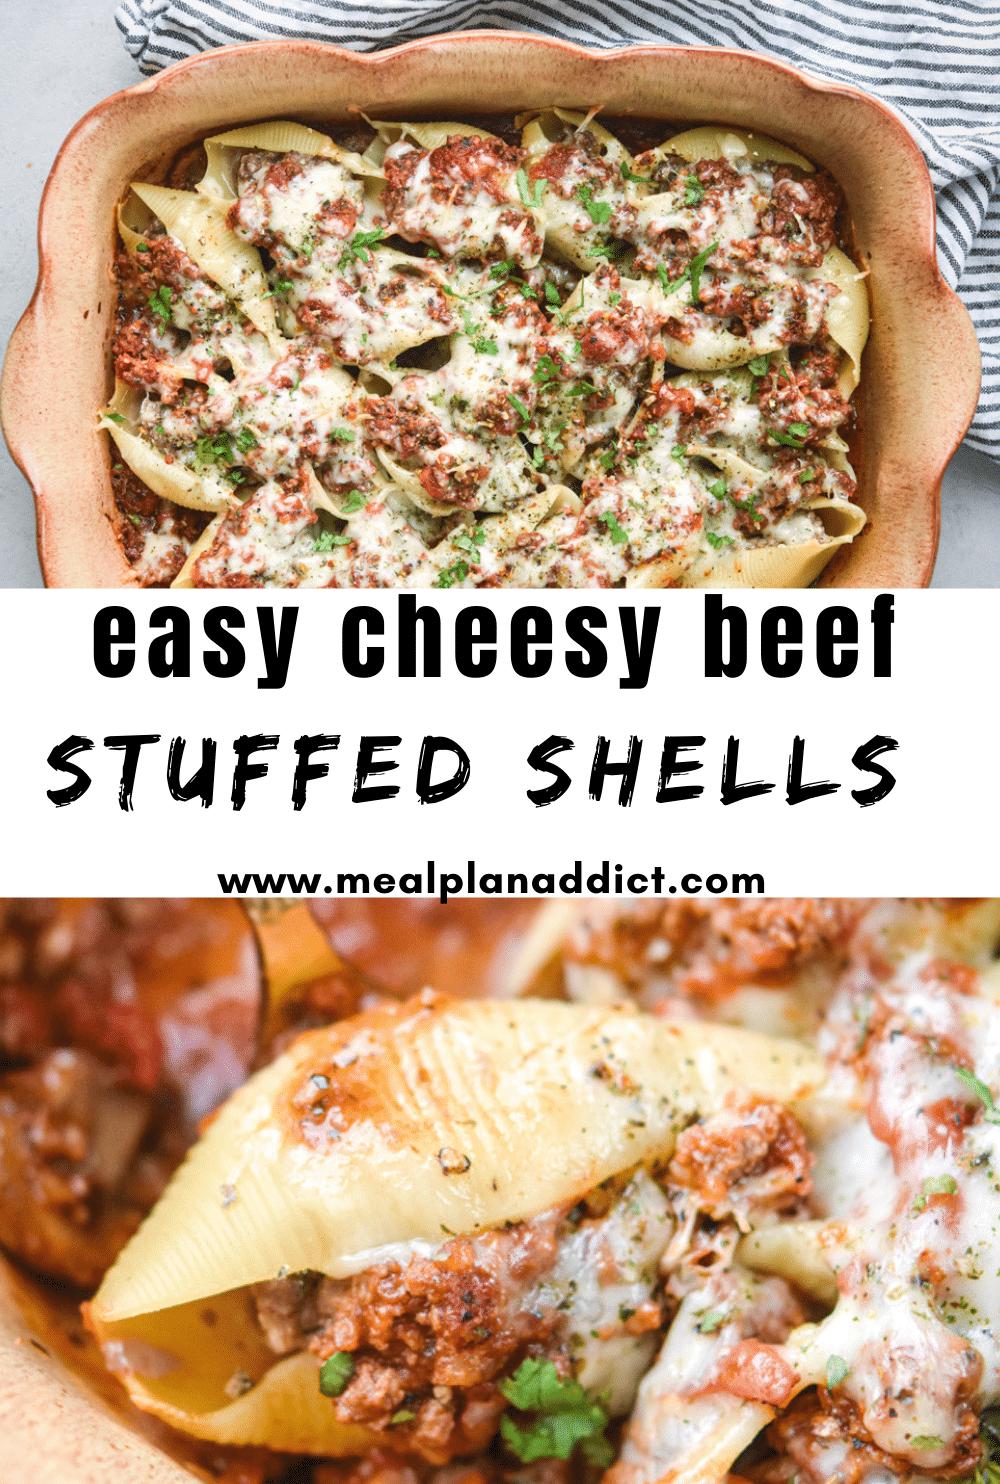 cheesy beef stuffed shells (1)